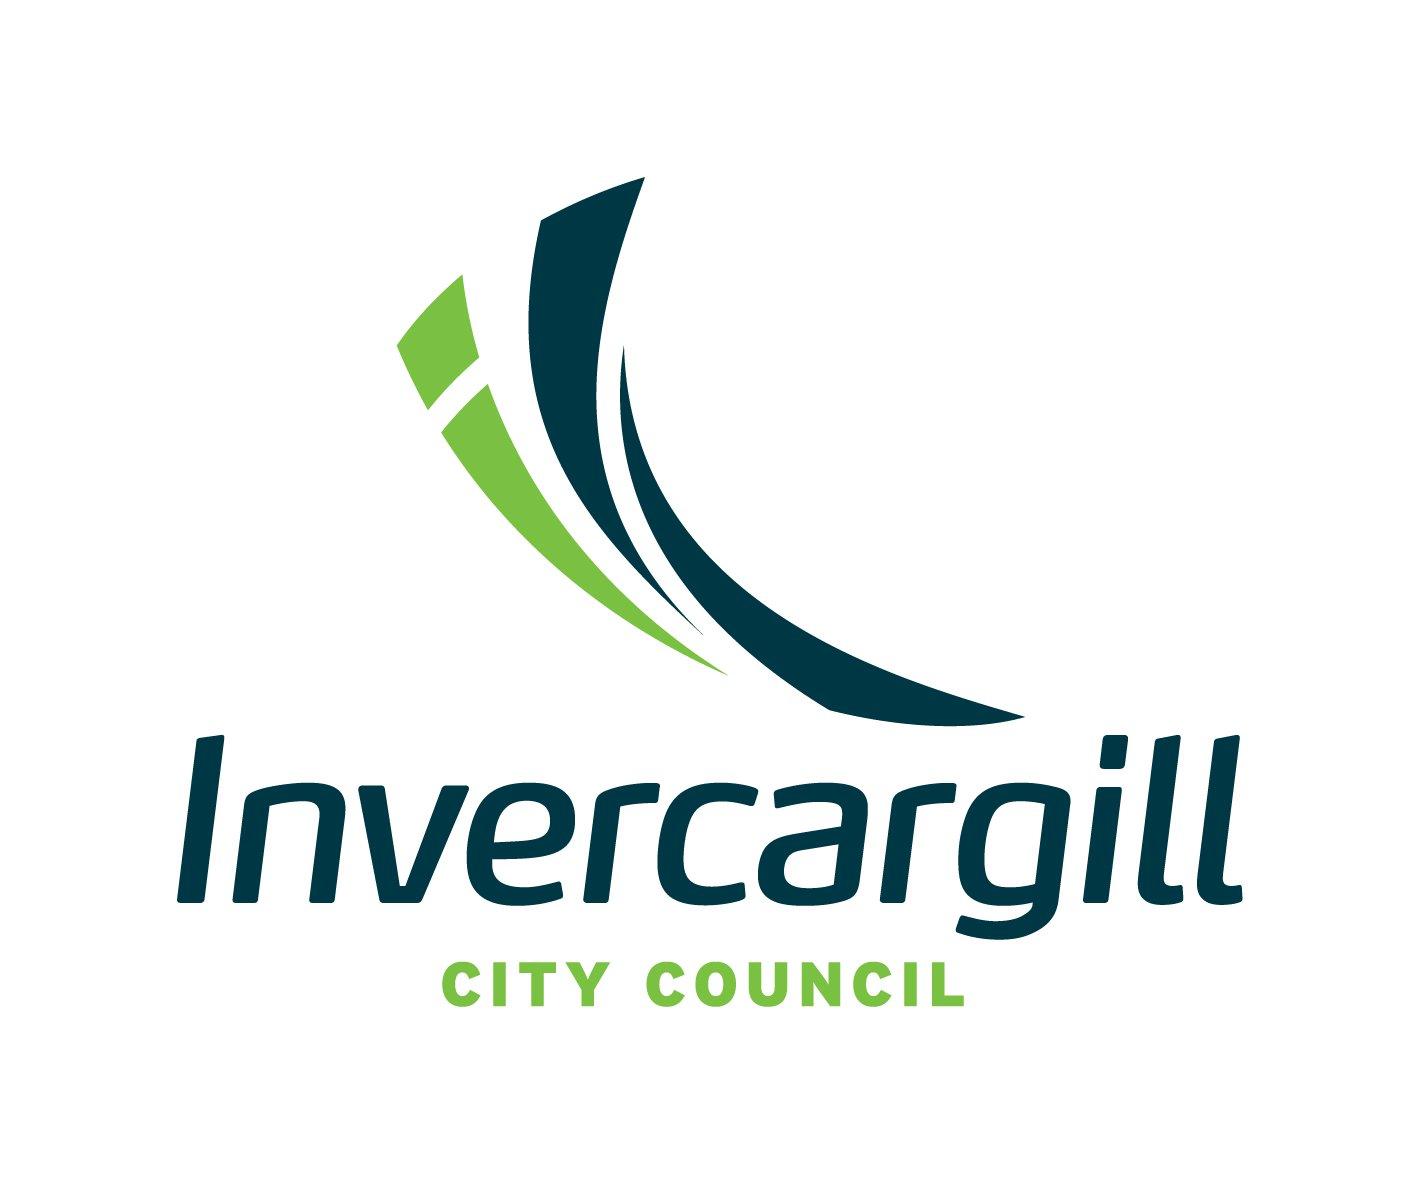 Invercargill city council